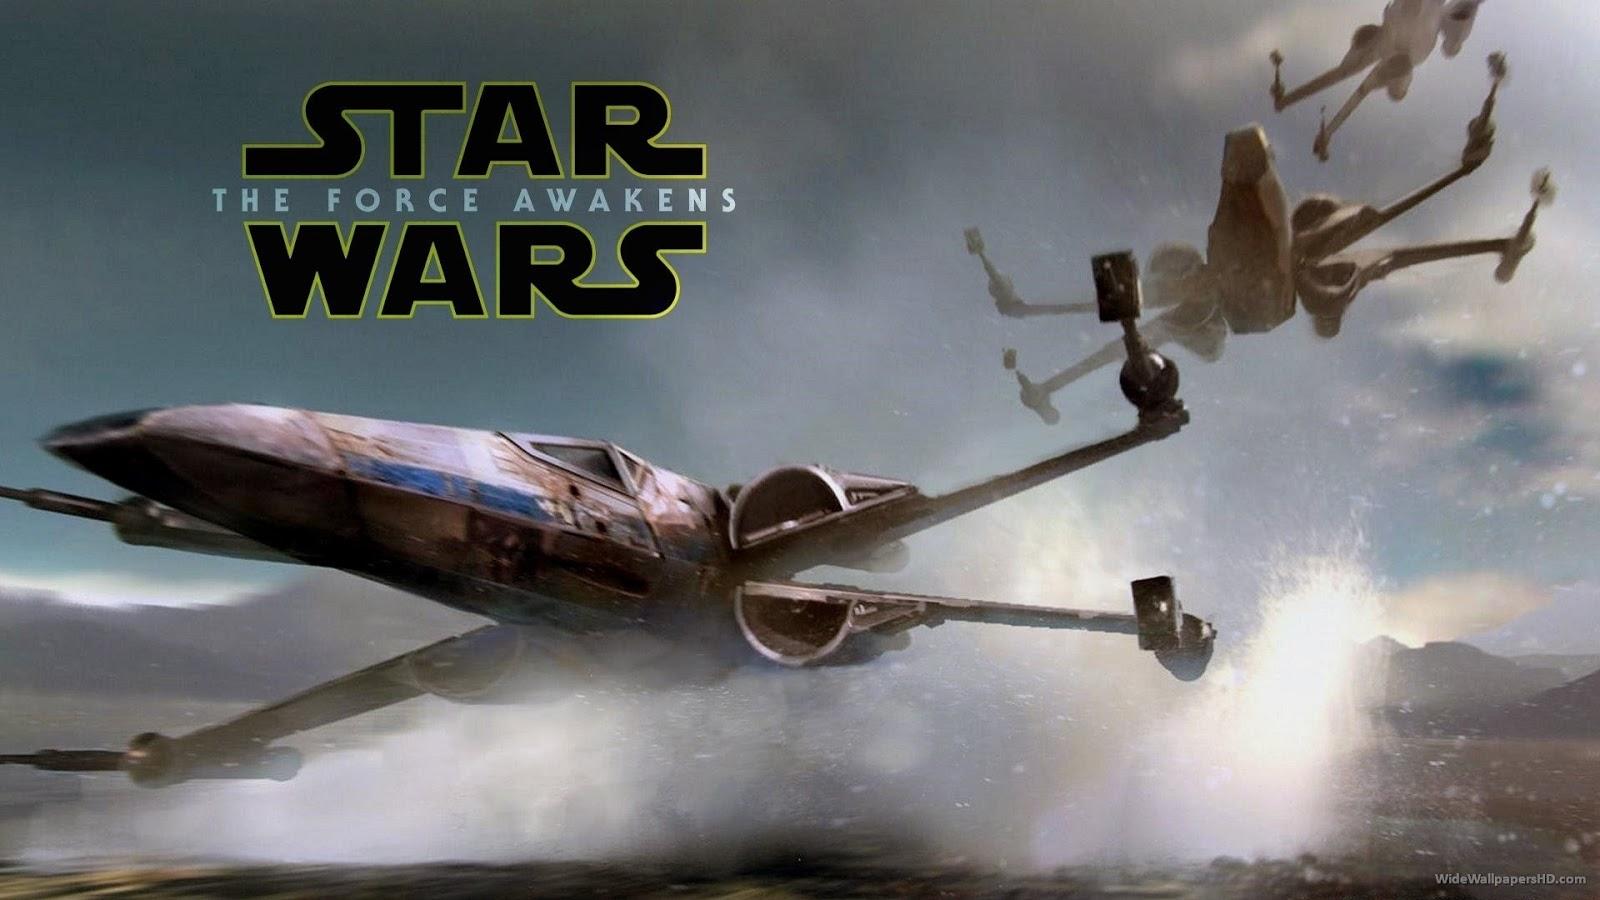 The Force awakens wallpaper iphone